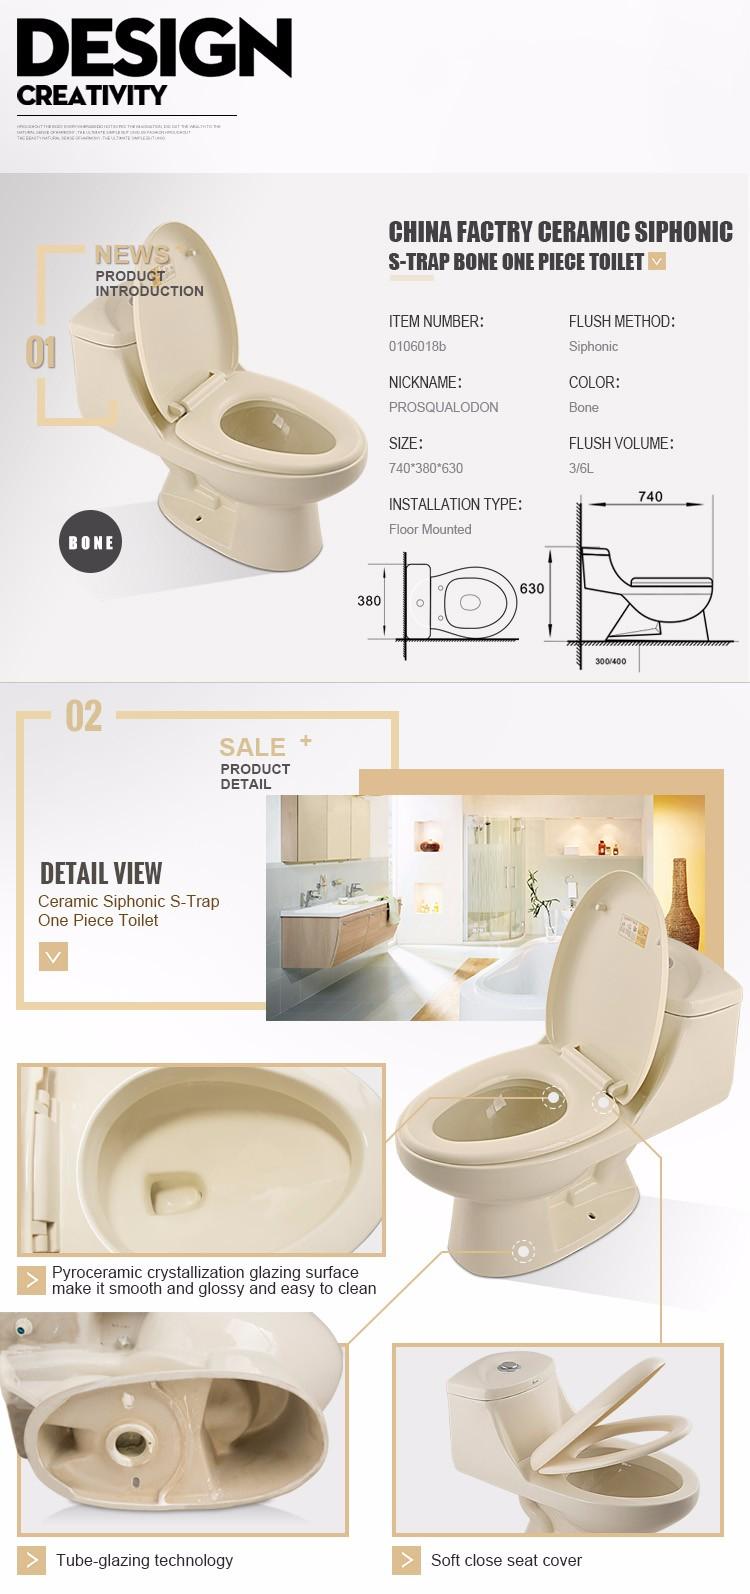 Toilettes Os Couleur Cuvette Des Toilettes Buy Product On Alibaba Com